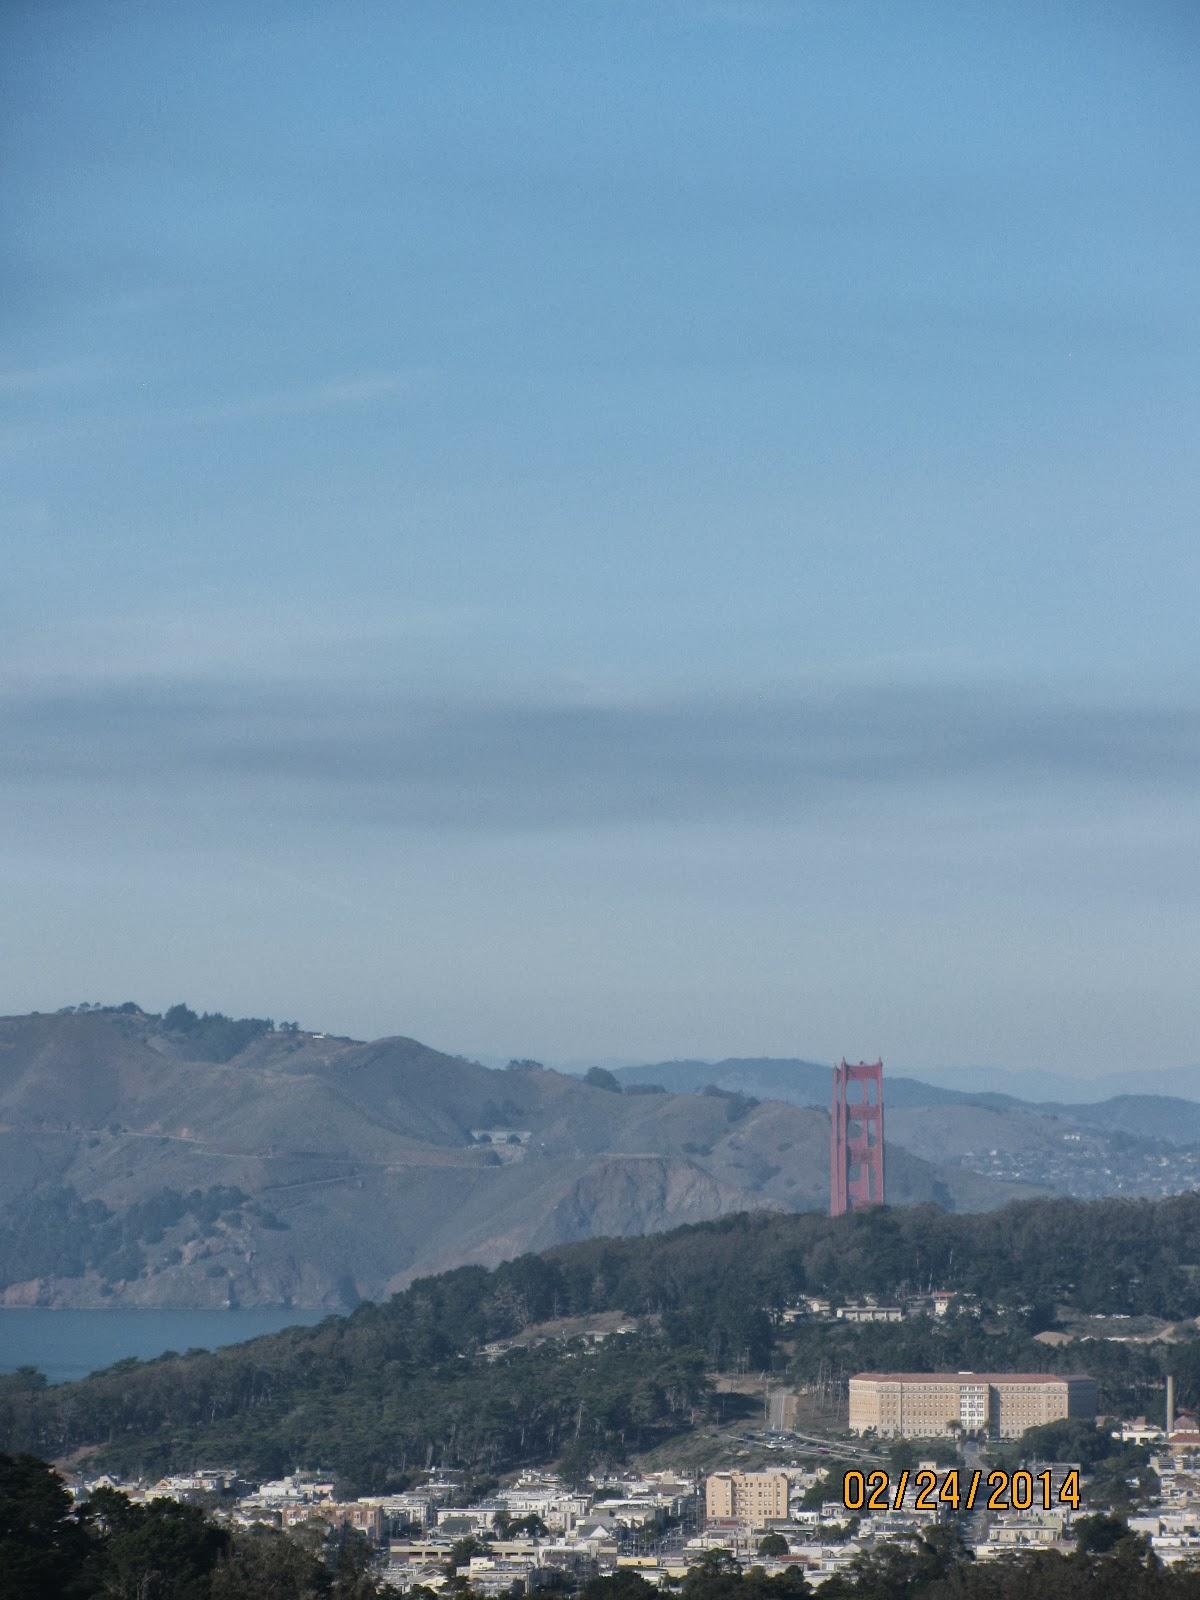 Grand View Park- View of Golden Gate Bridge